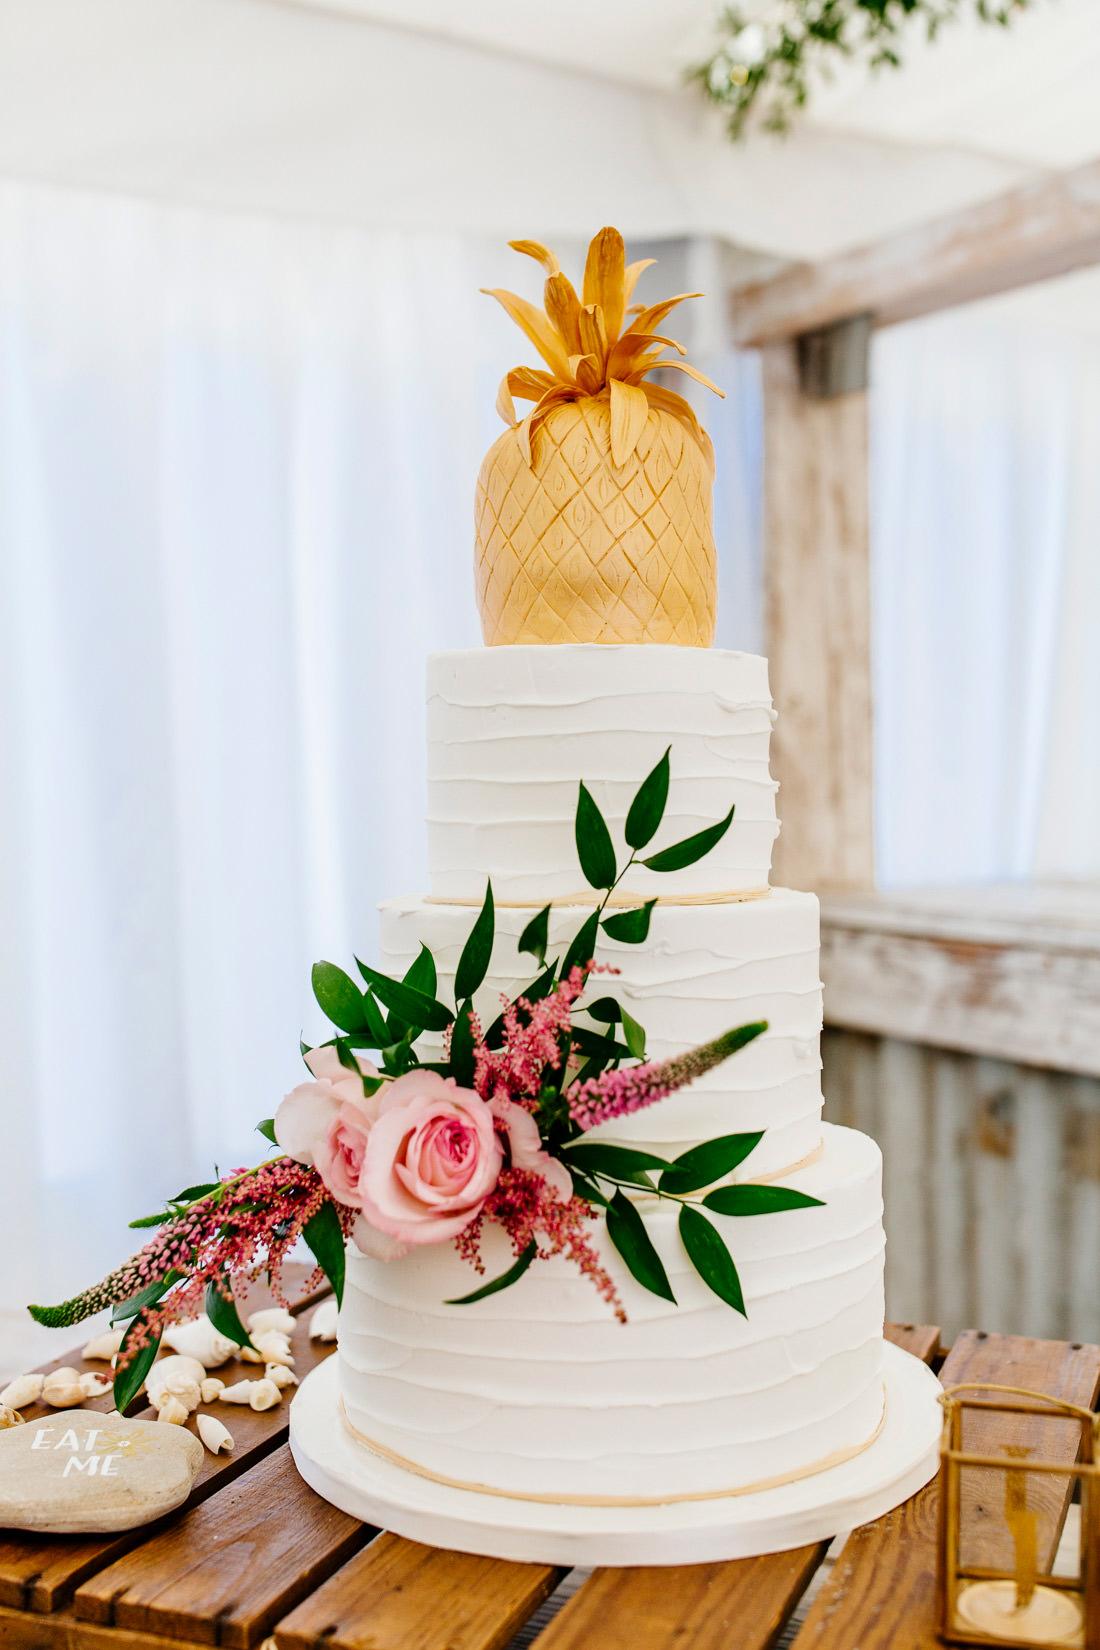 Whitsable-East-Quay-wedding-kent-photographer-Epic-Love-Story-100